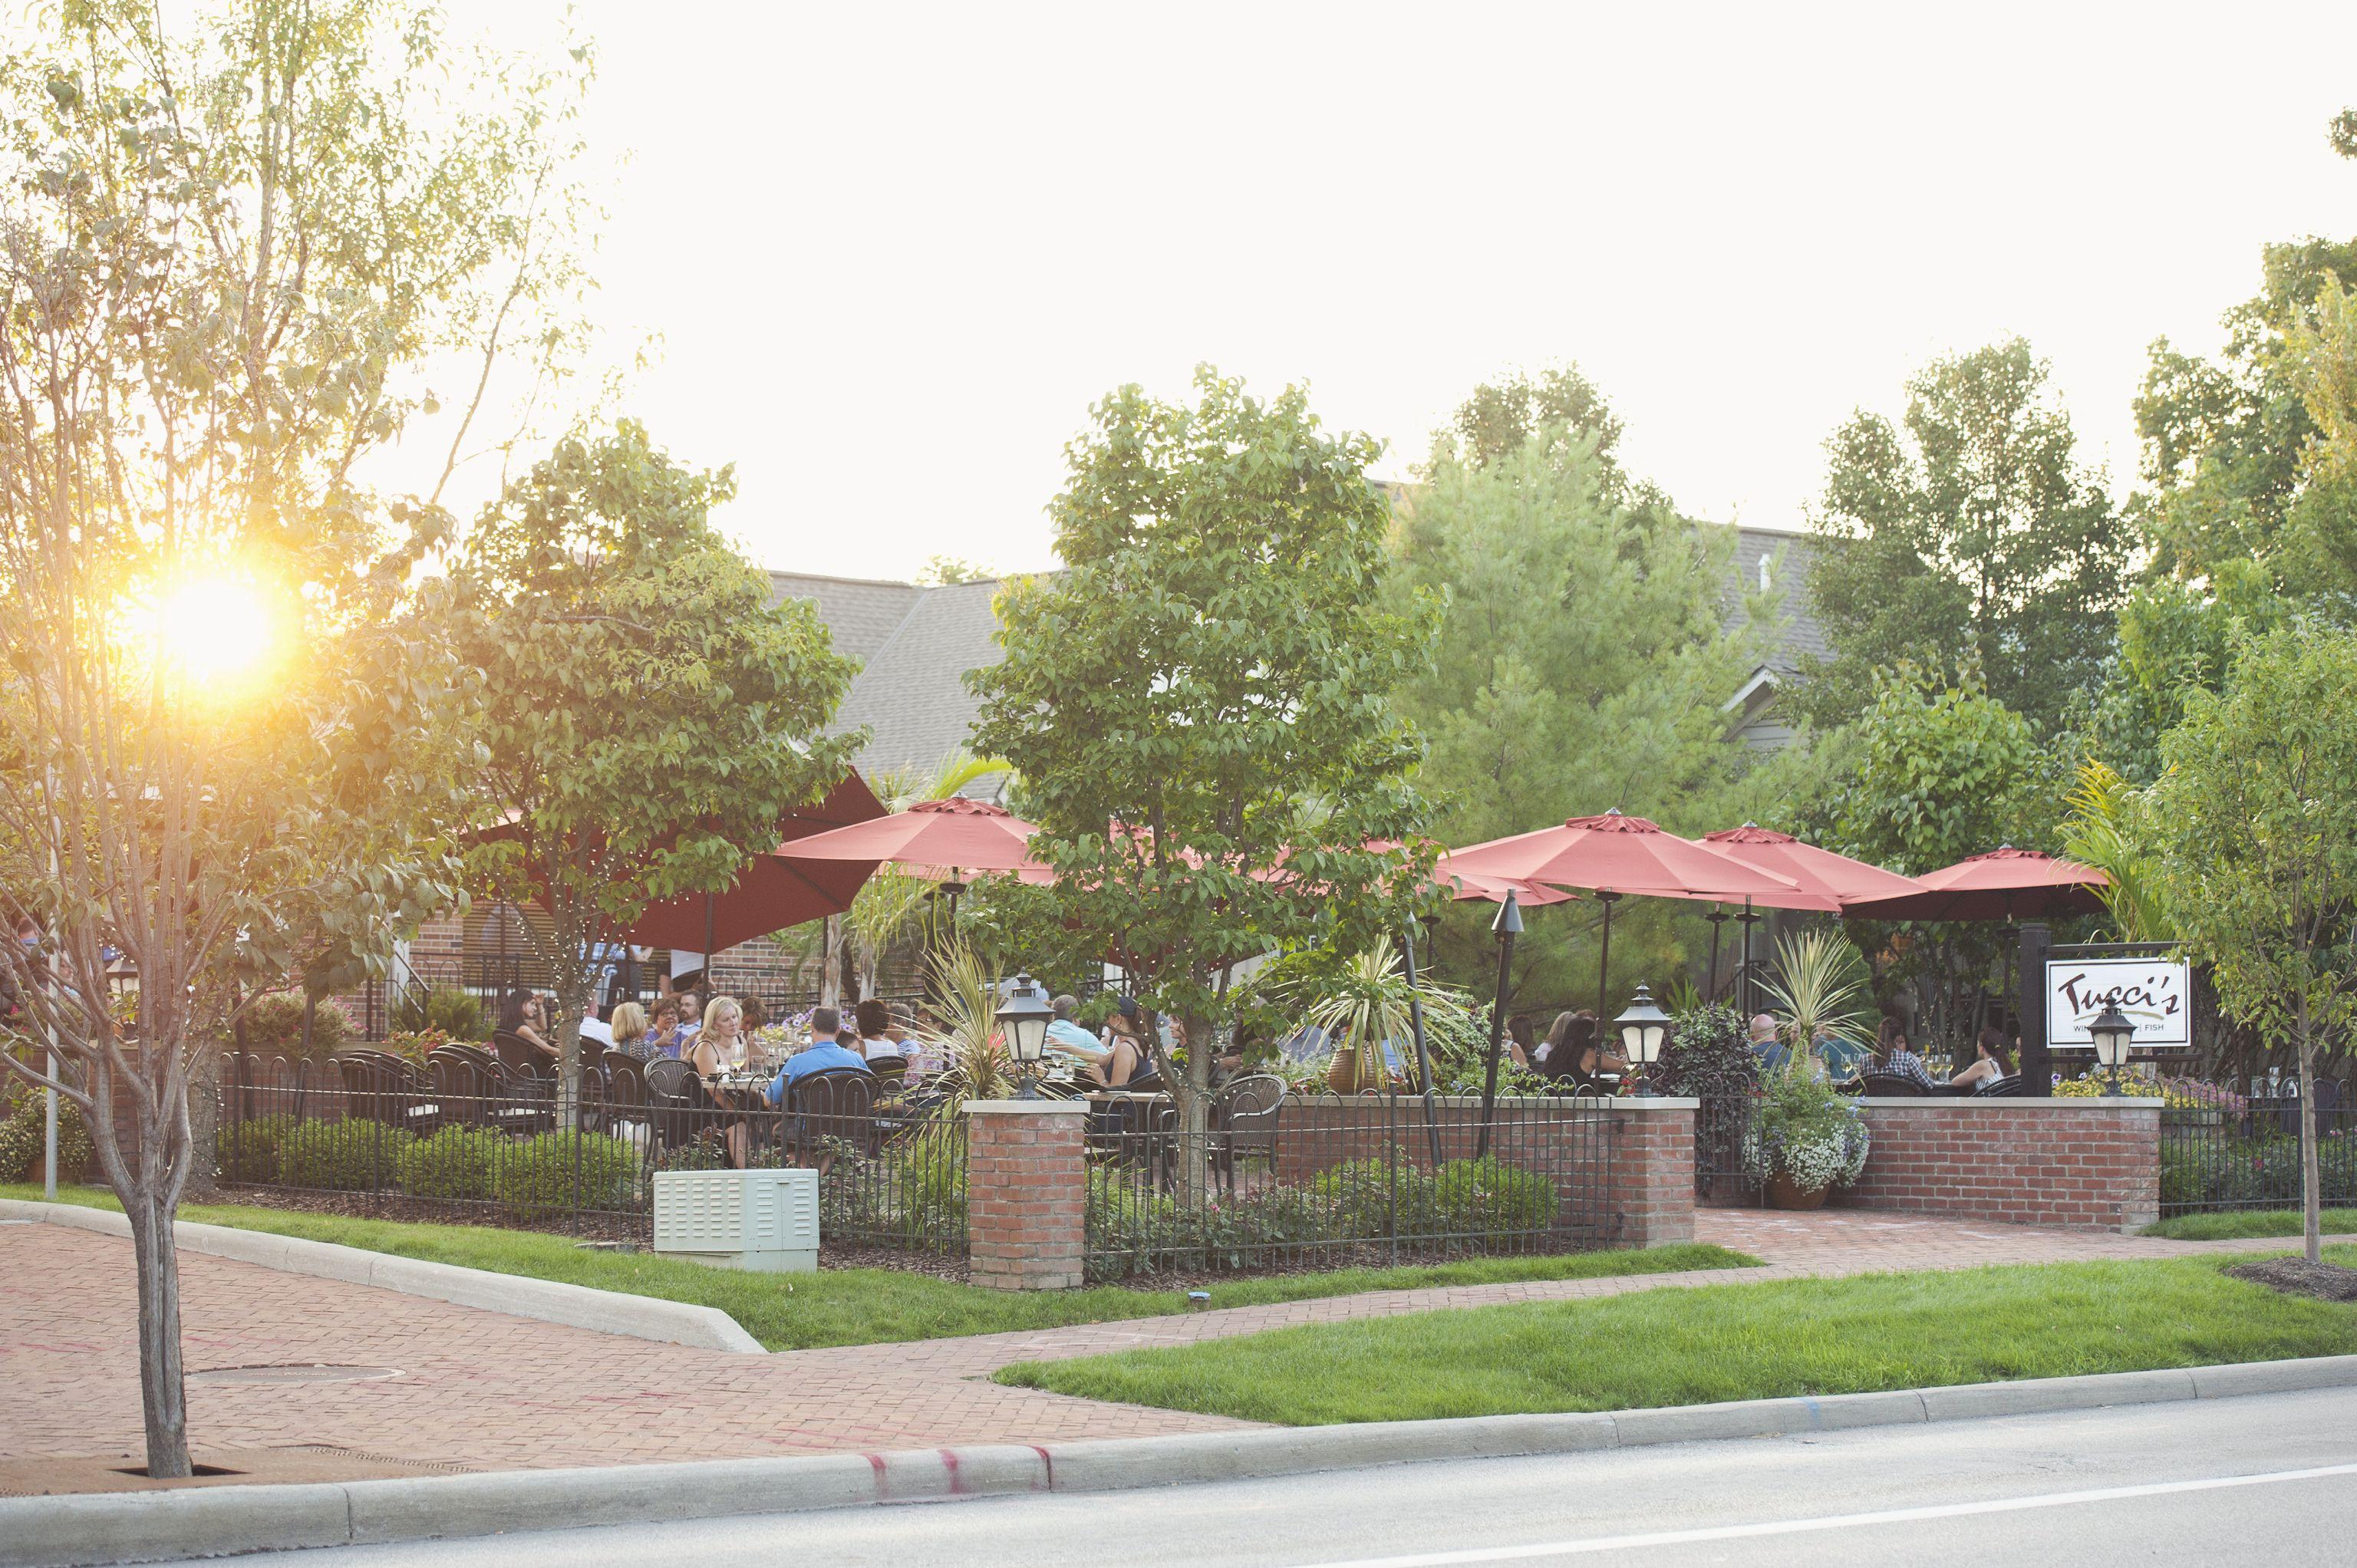 Tuccis patio in dublin ohio dublin ohio restaurants